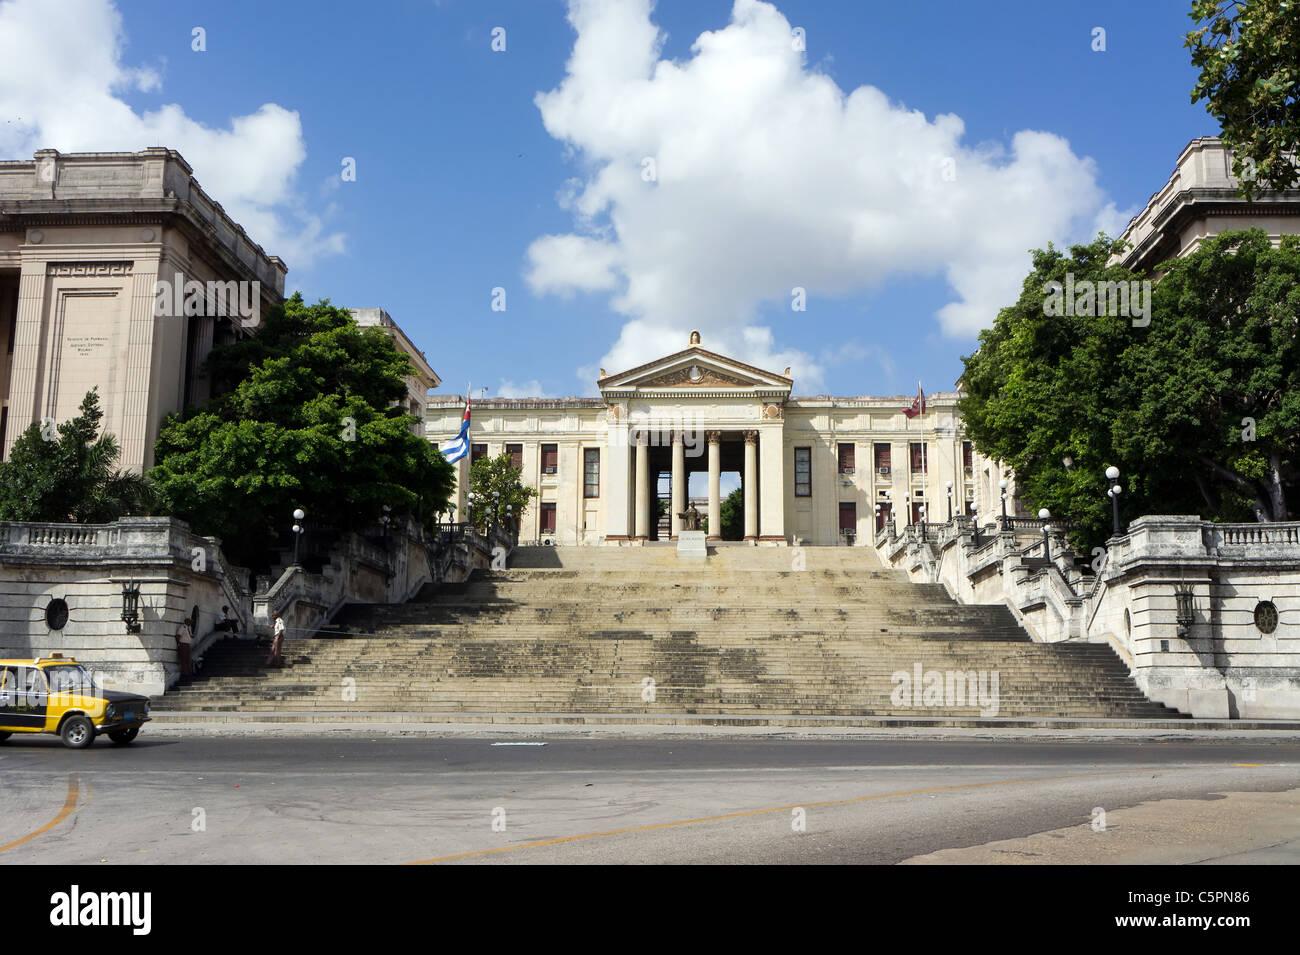 Fidel Castro's alma mater, the Universidad de La Habana (Habana University), Havana, Cuba - Stock Image